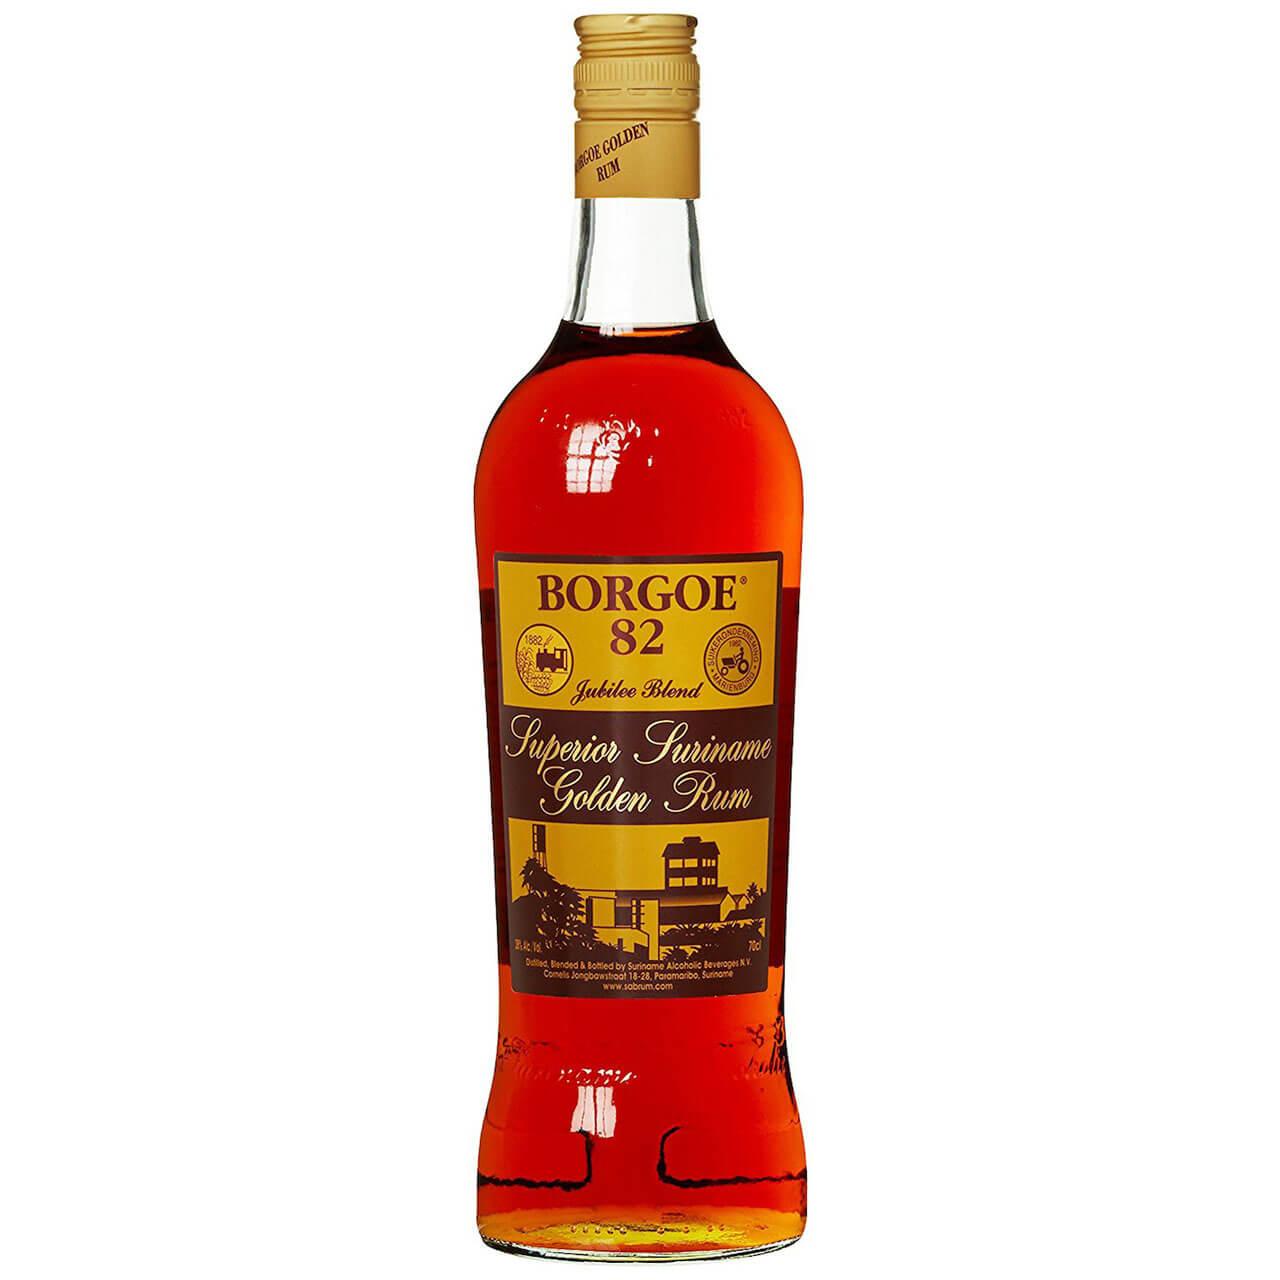 Borgoe Rum 82 Jubilée Blend